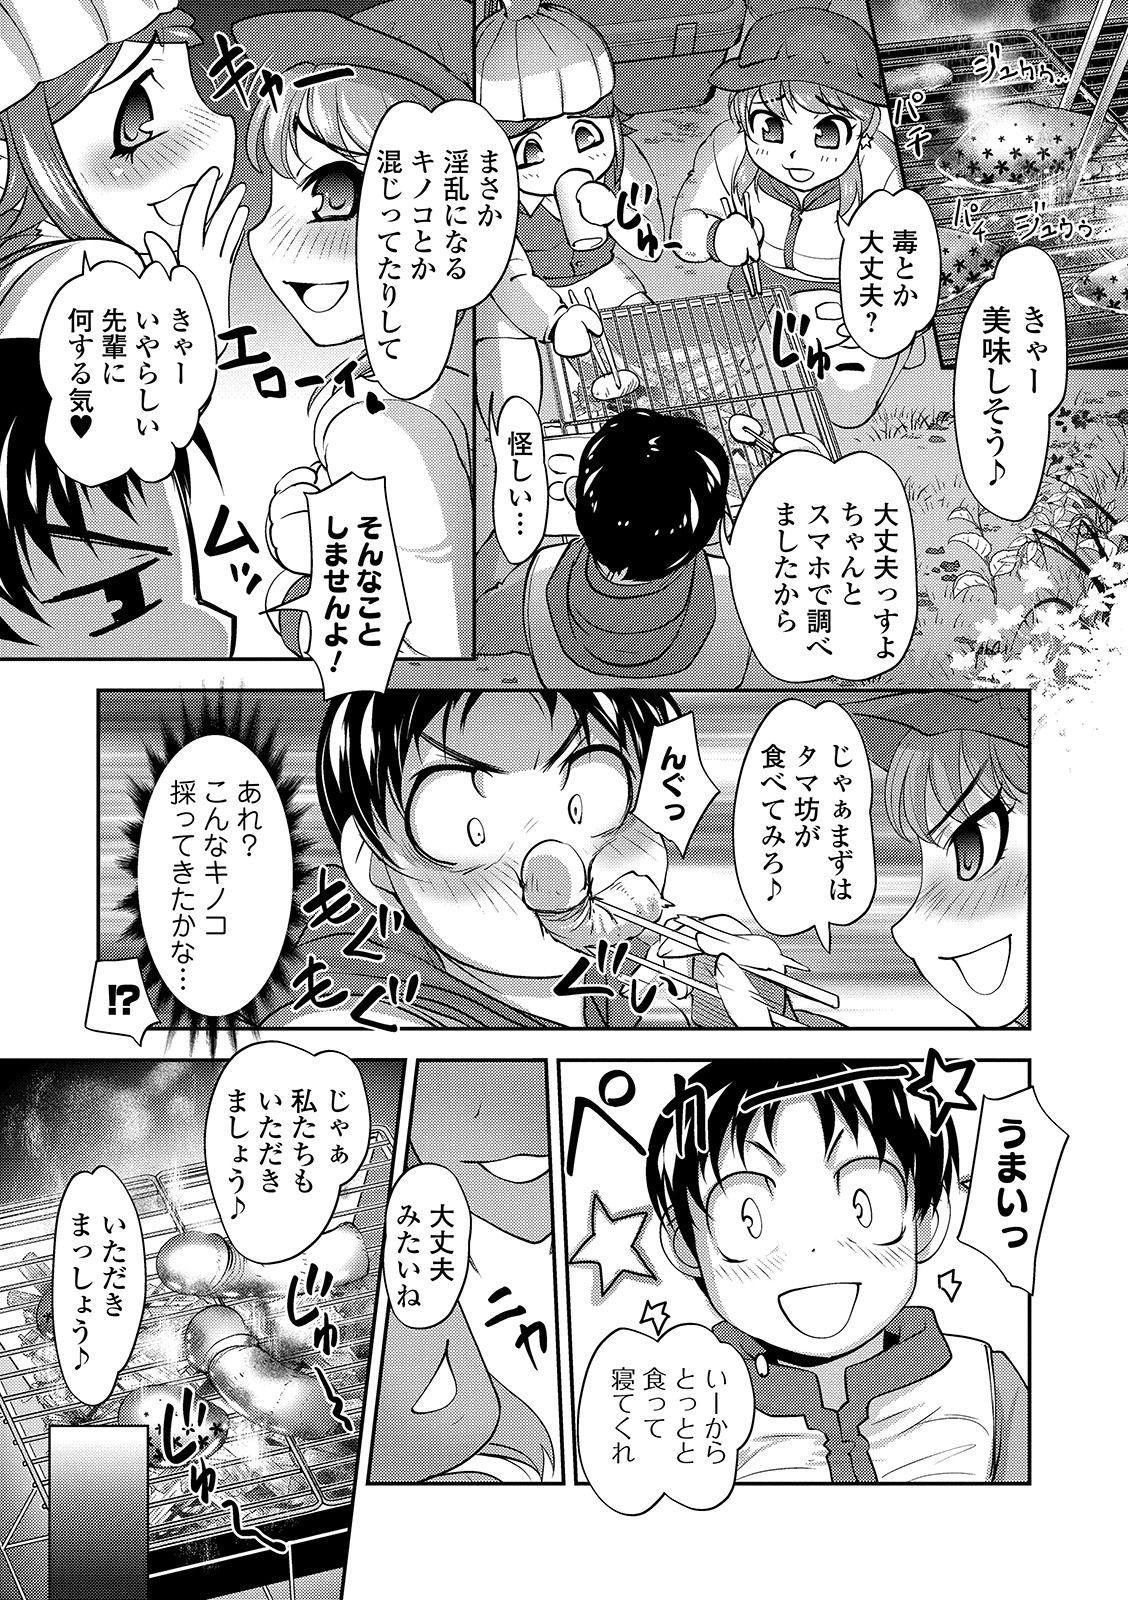 COMIC Shigekiteki SQUIRT!! Vol. 15 152